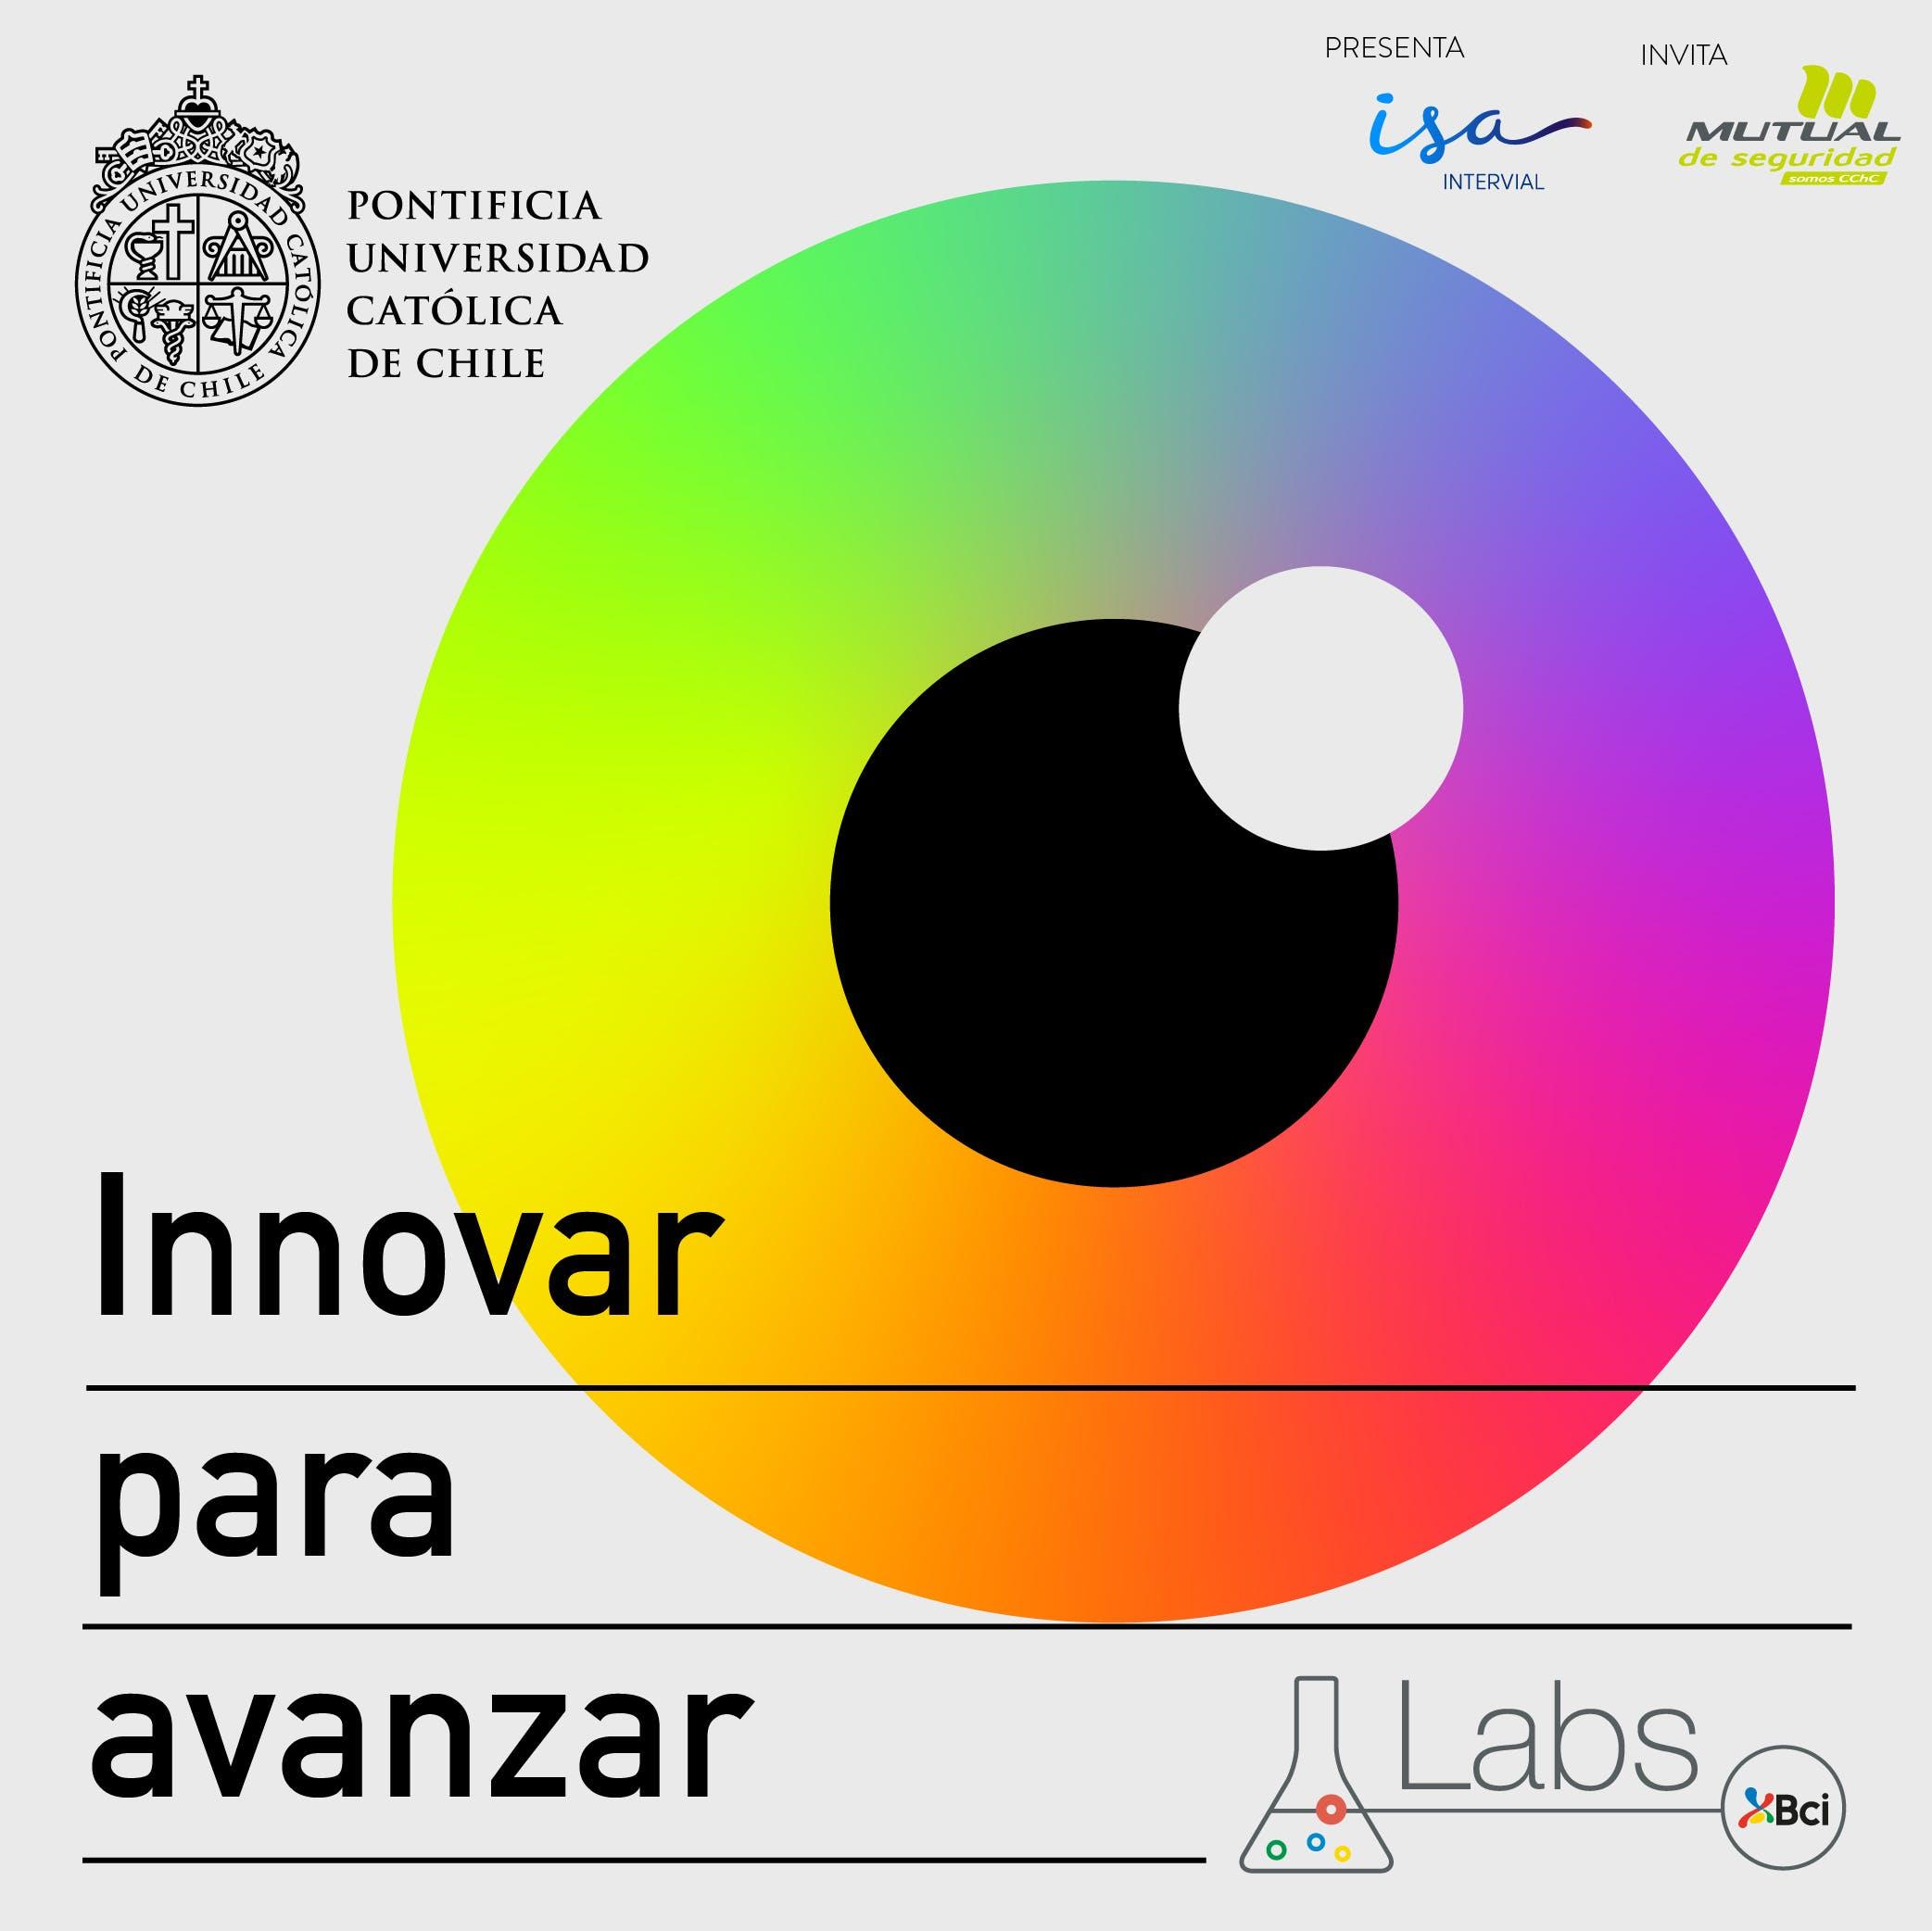 Innovar para avanzar